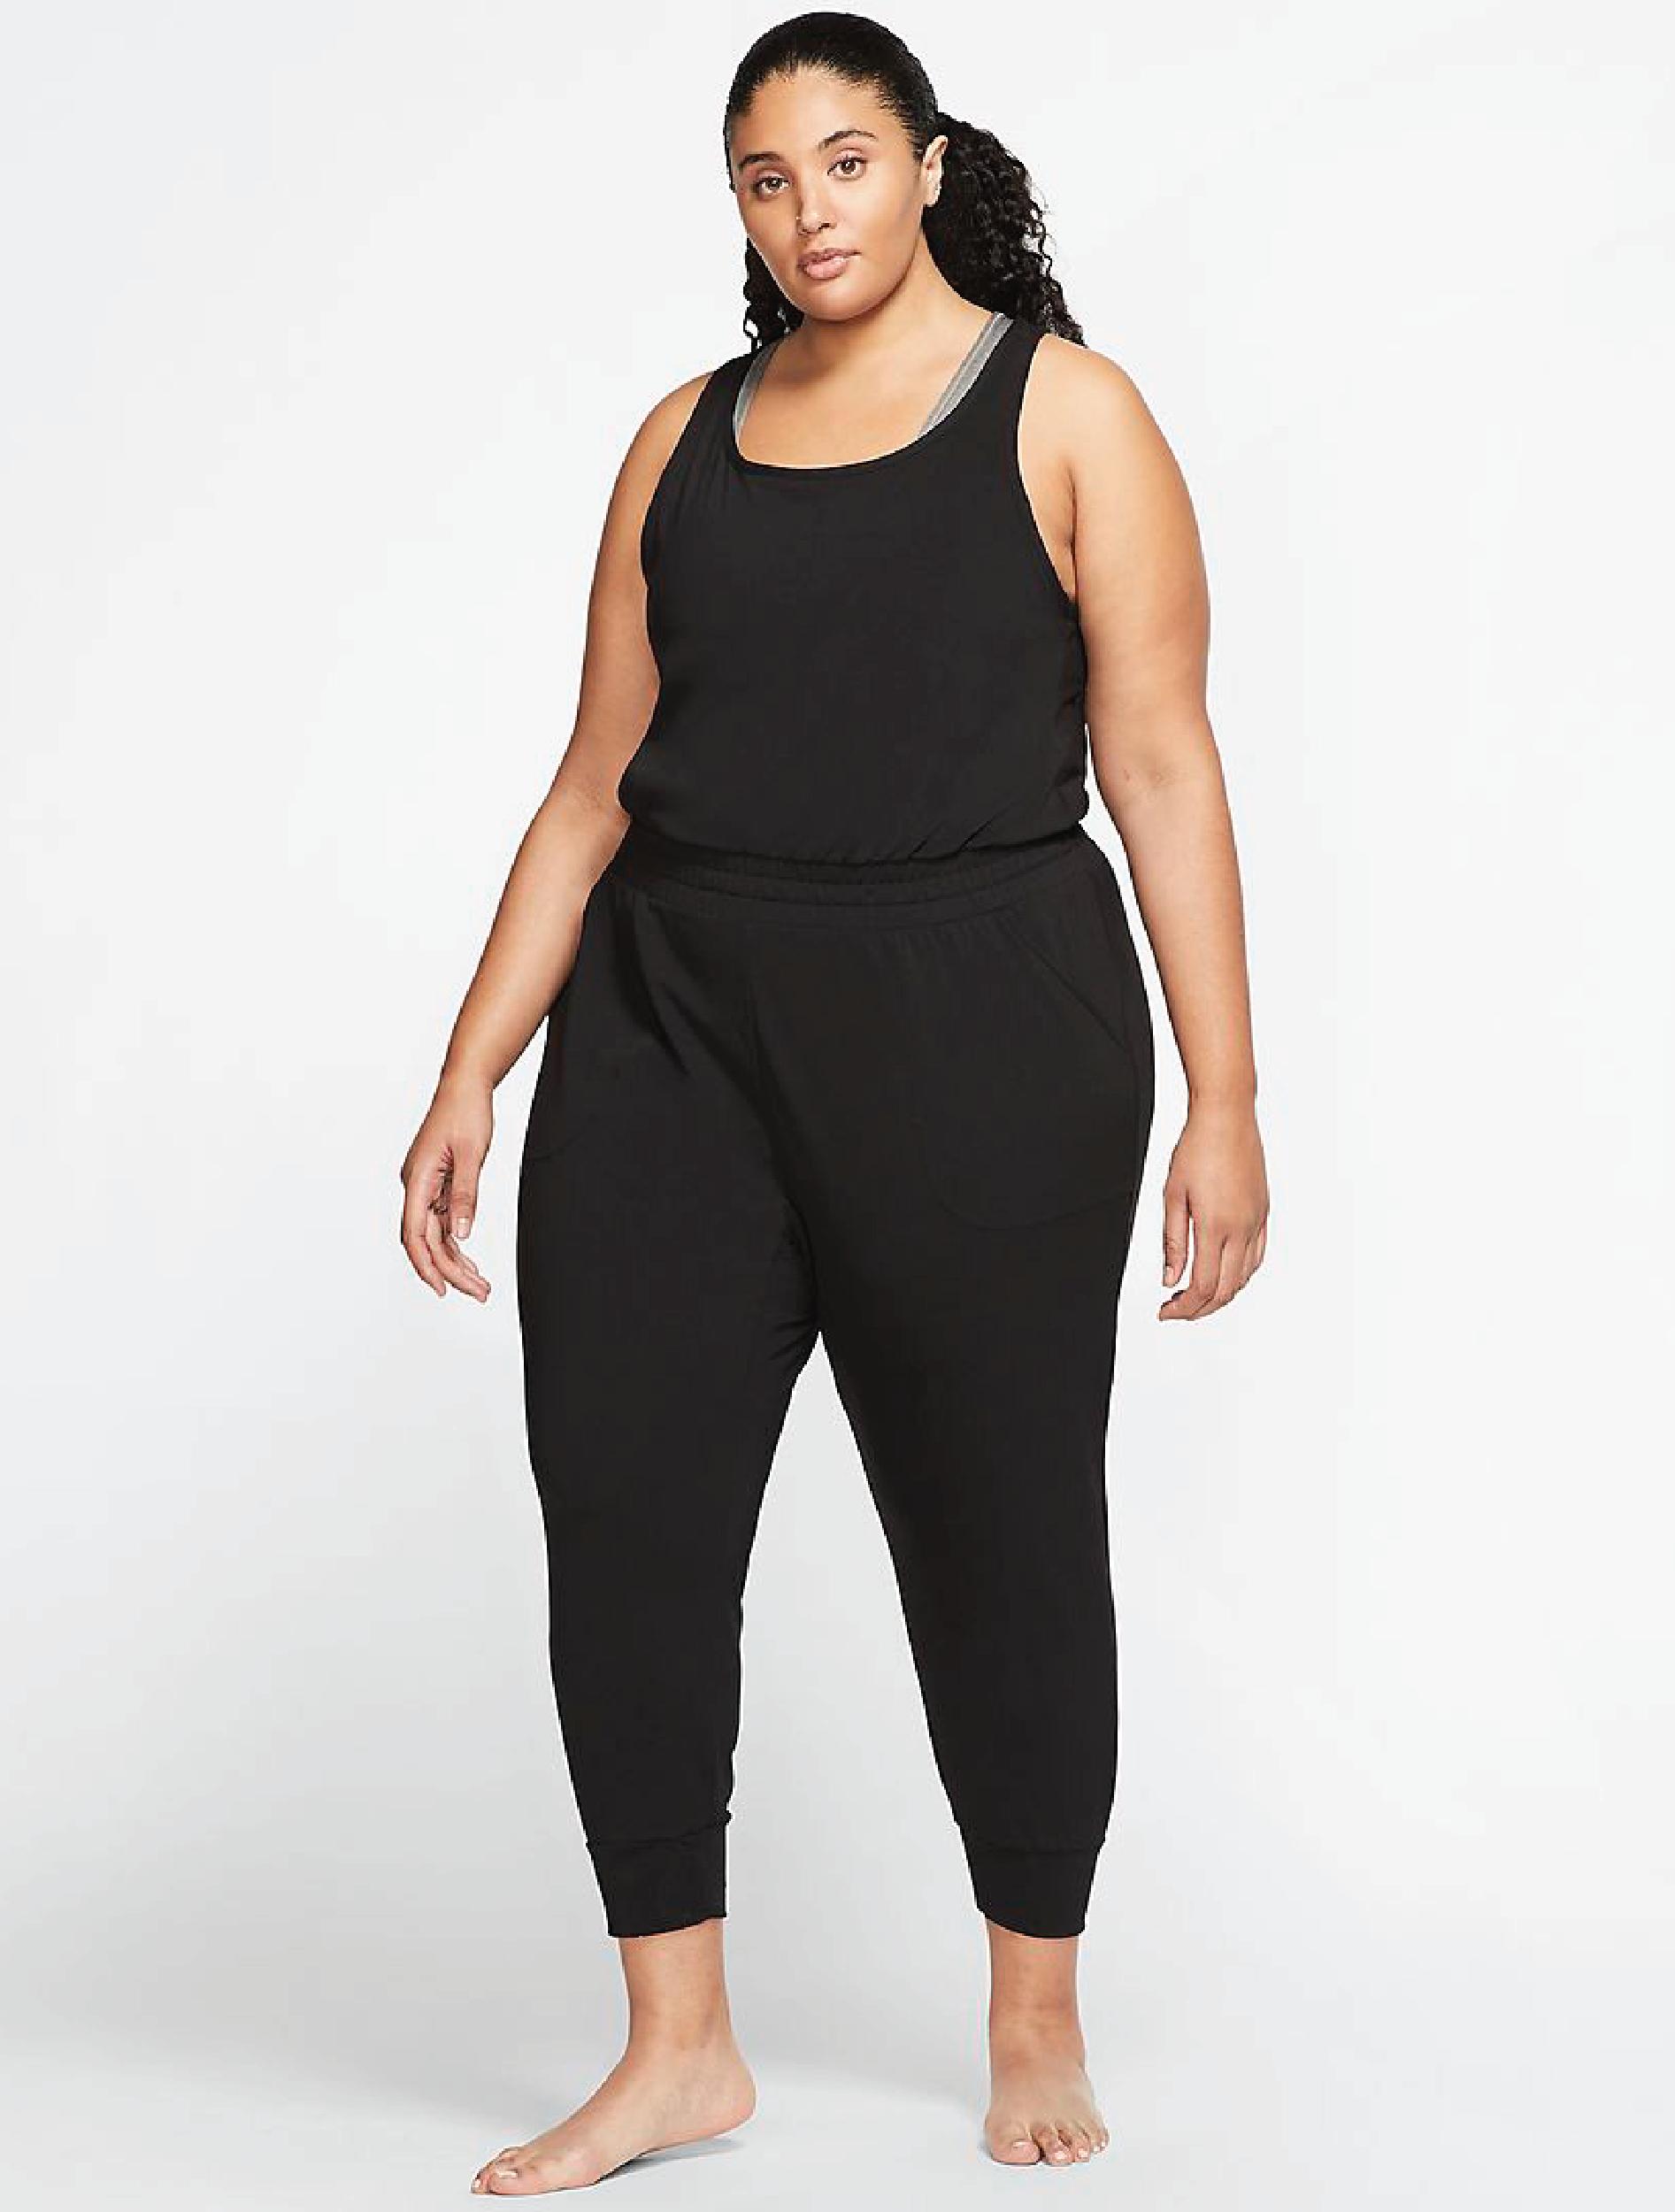 A plus sized model wearing the black jumpsuit